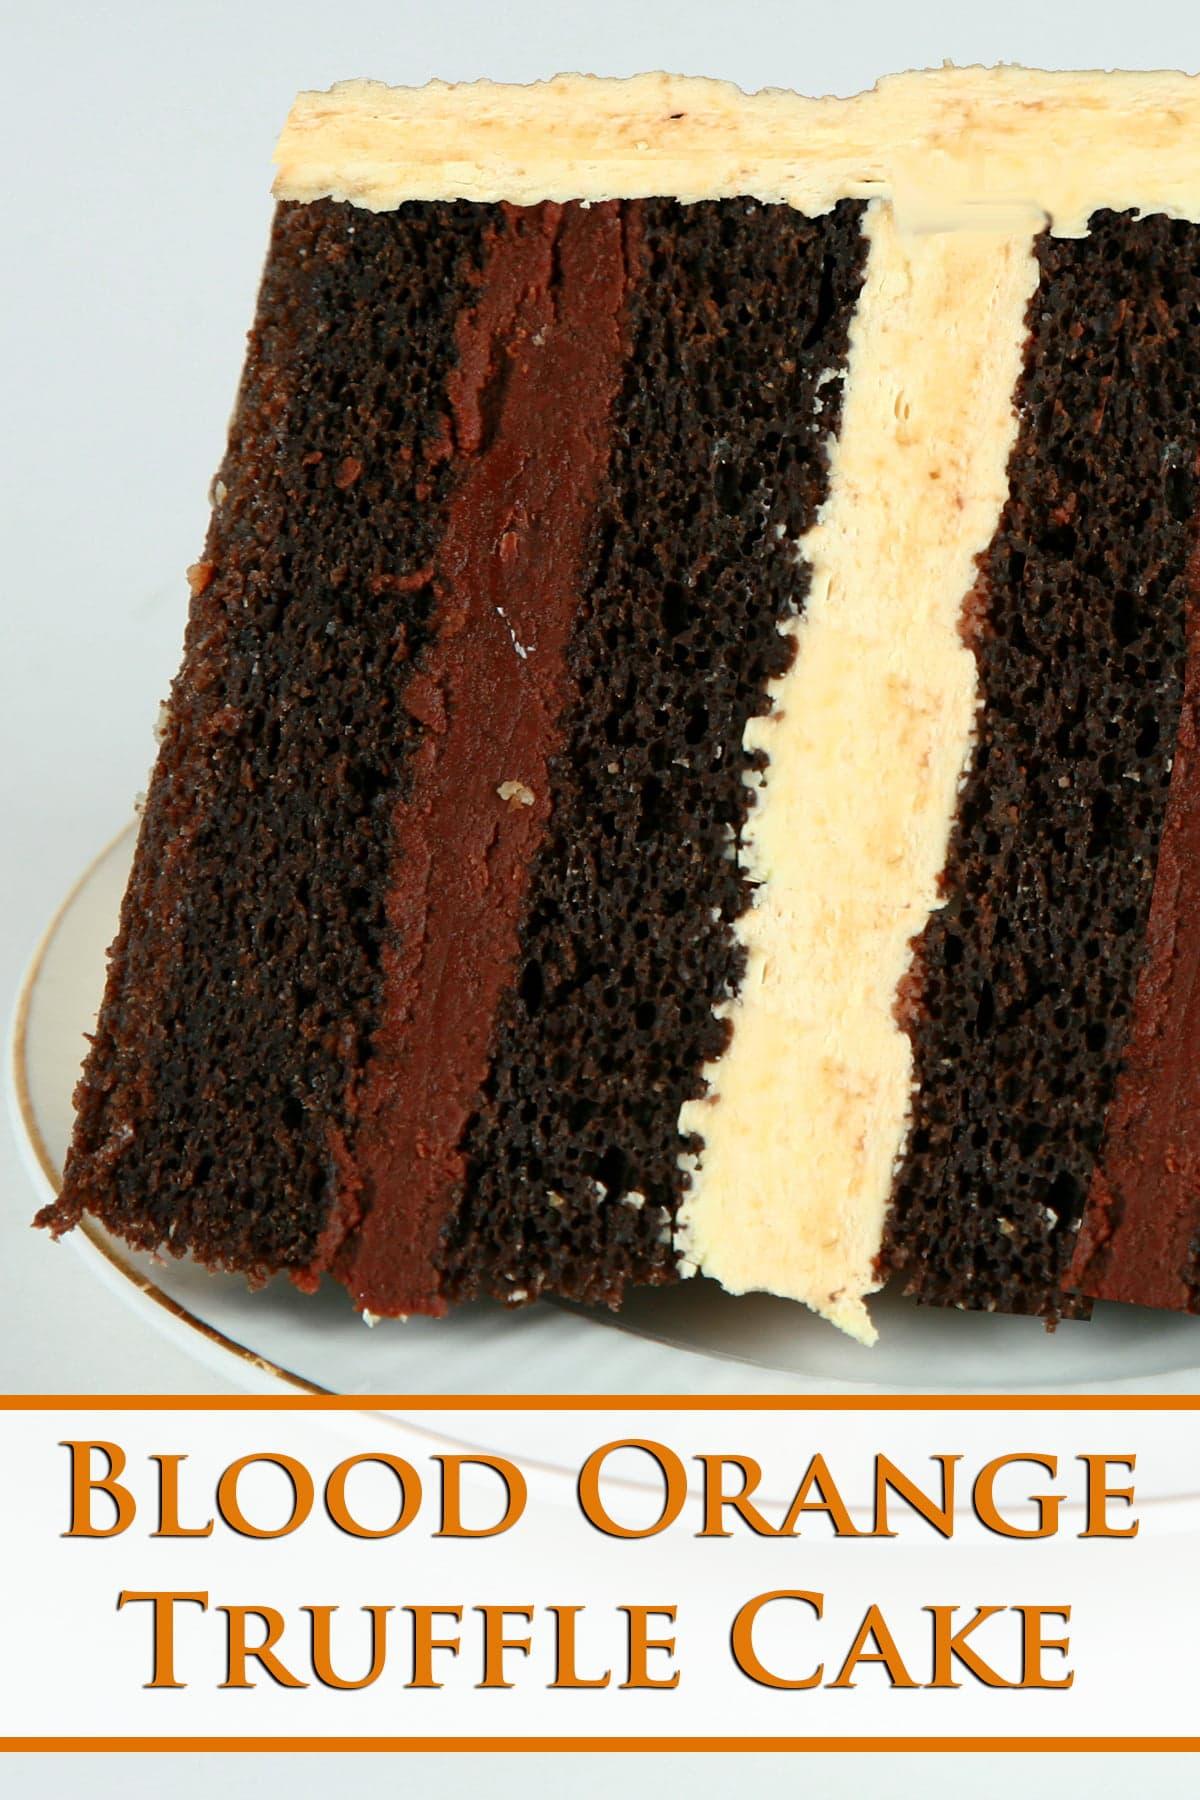 A slice of blood orange truffle cake - dark chocolate cake with layers of blood orange buttercream and blood orange chocolate ganache.